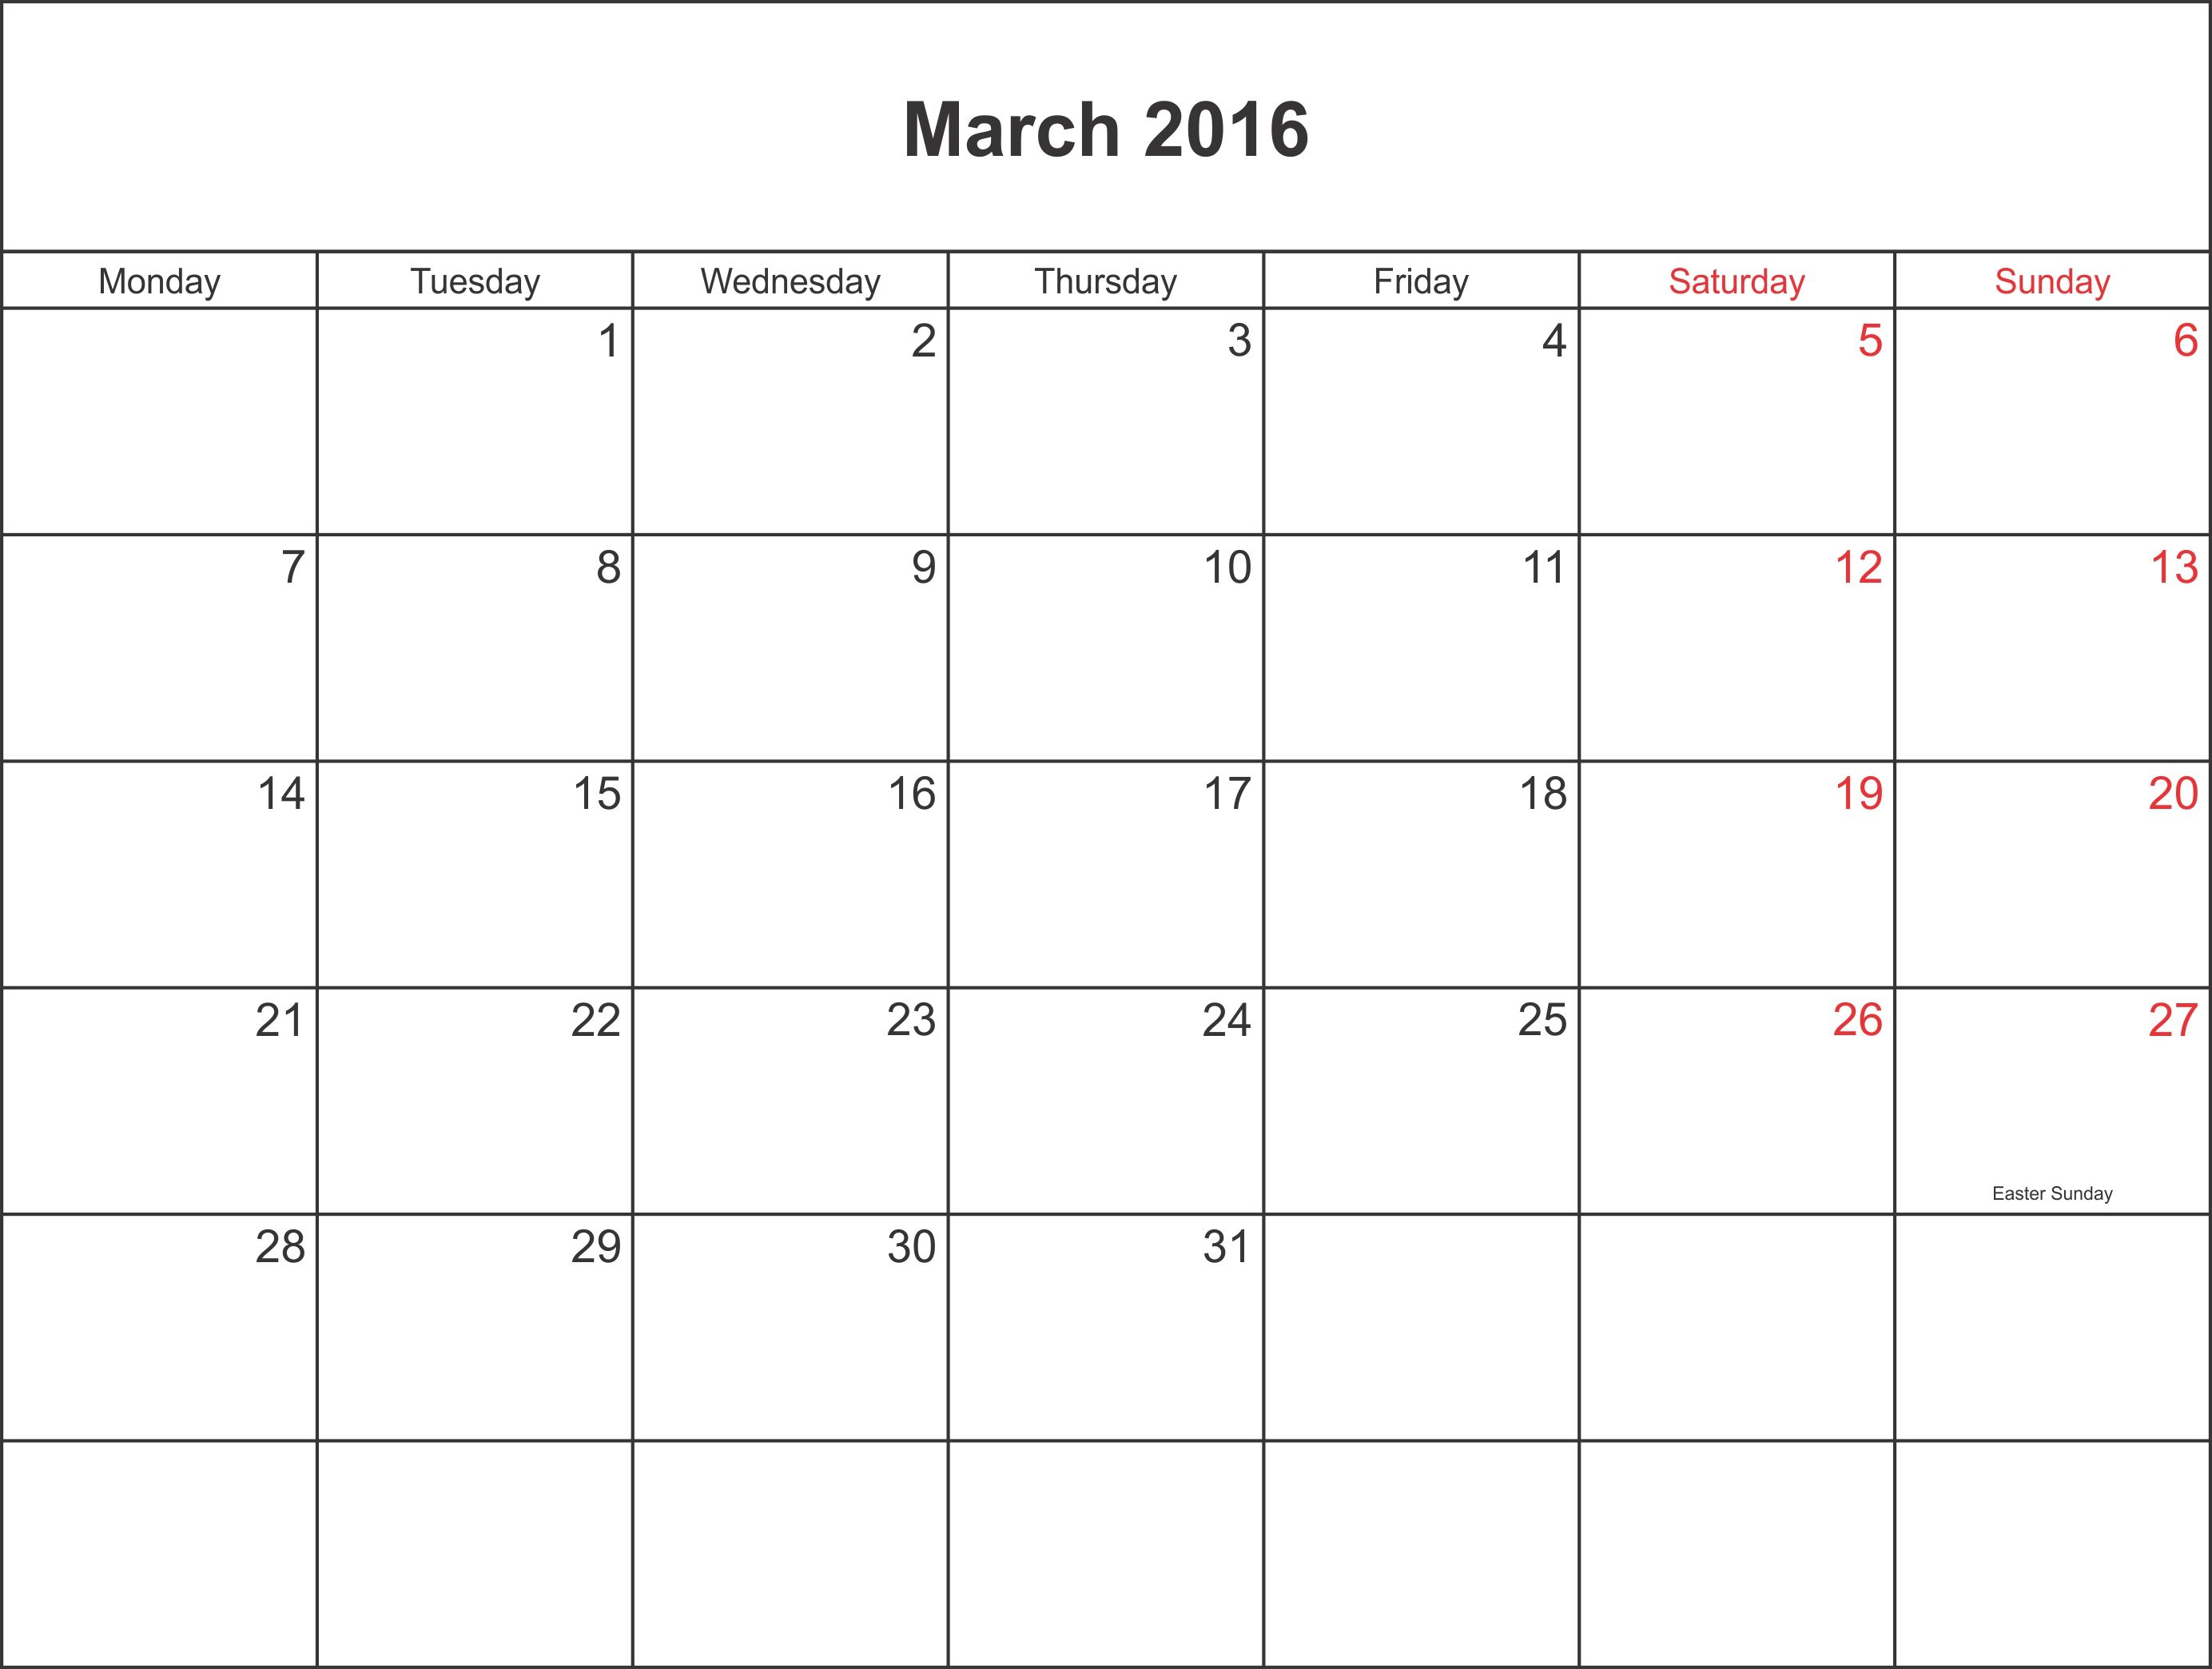 March 2016 Calendar Printable Calendar 2016 2017 | Calender | Pinterest